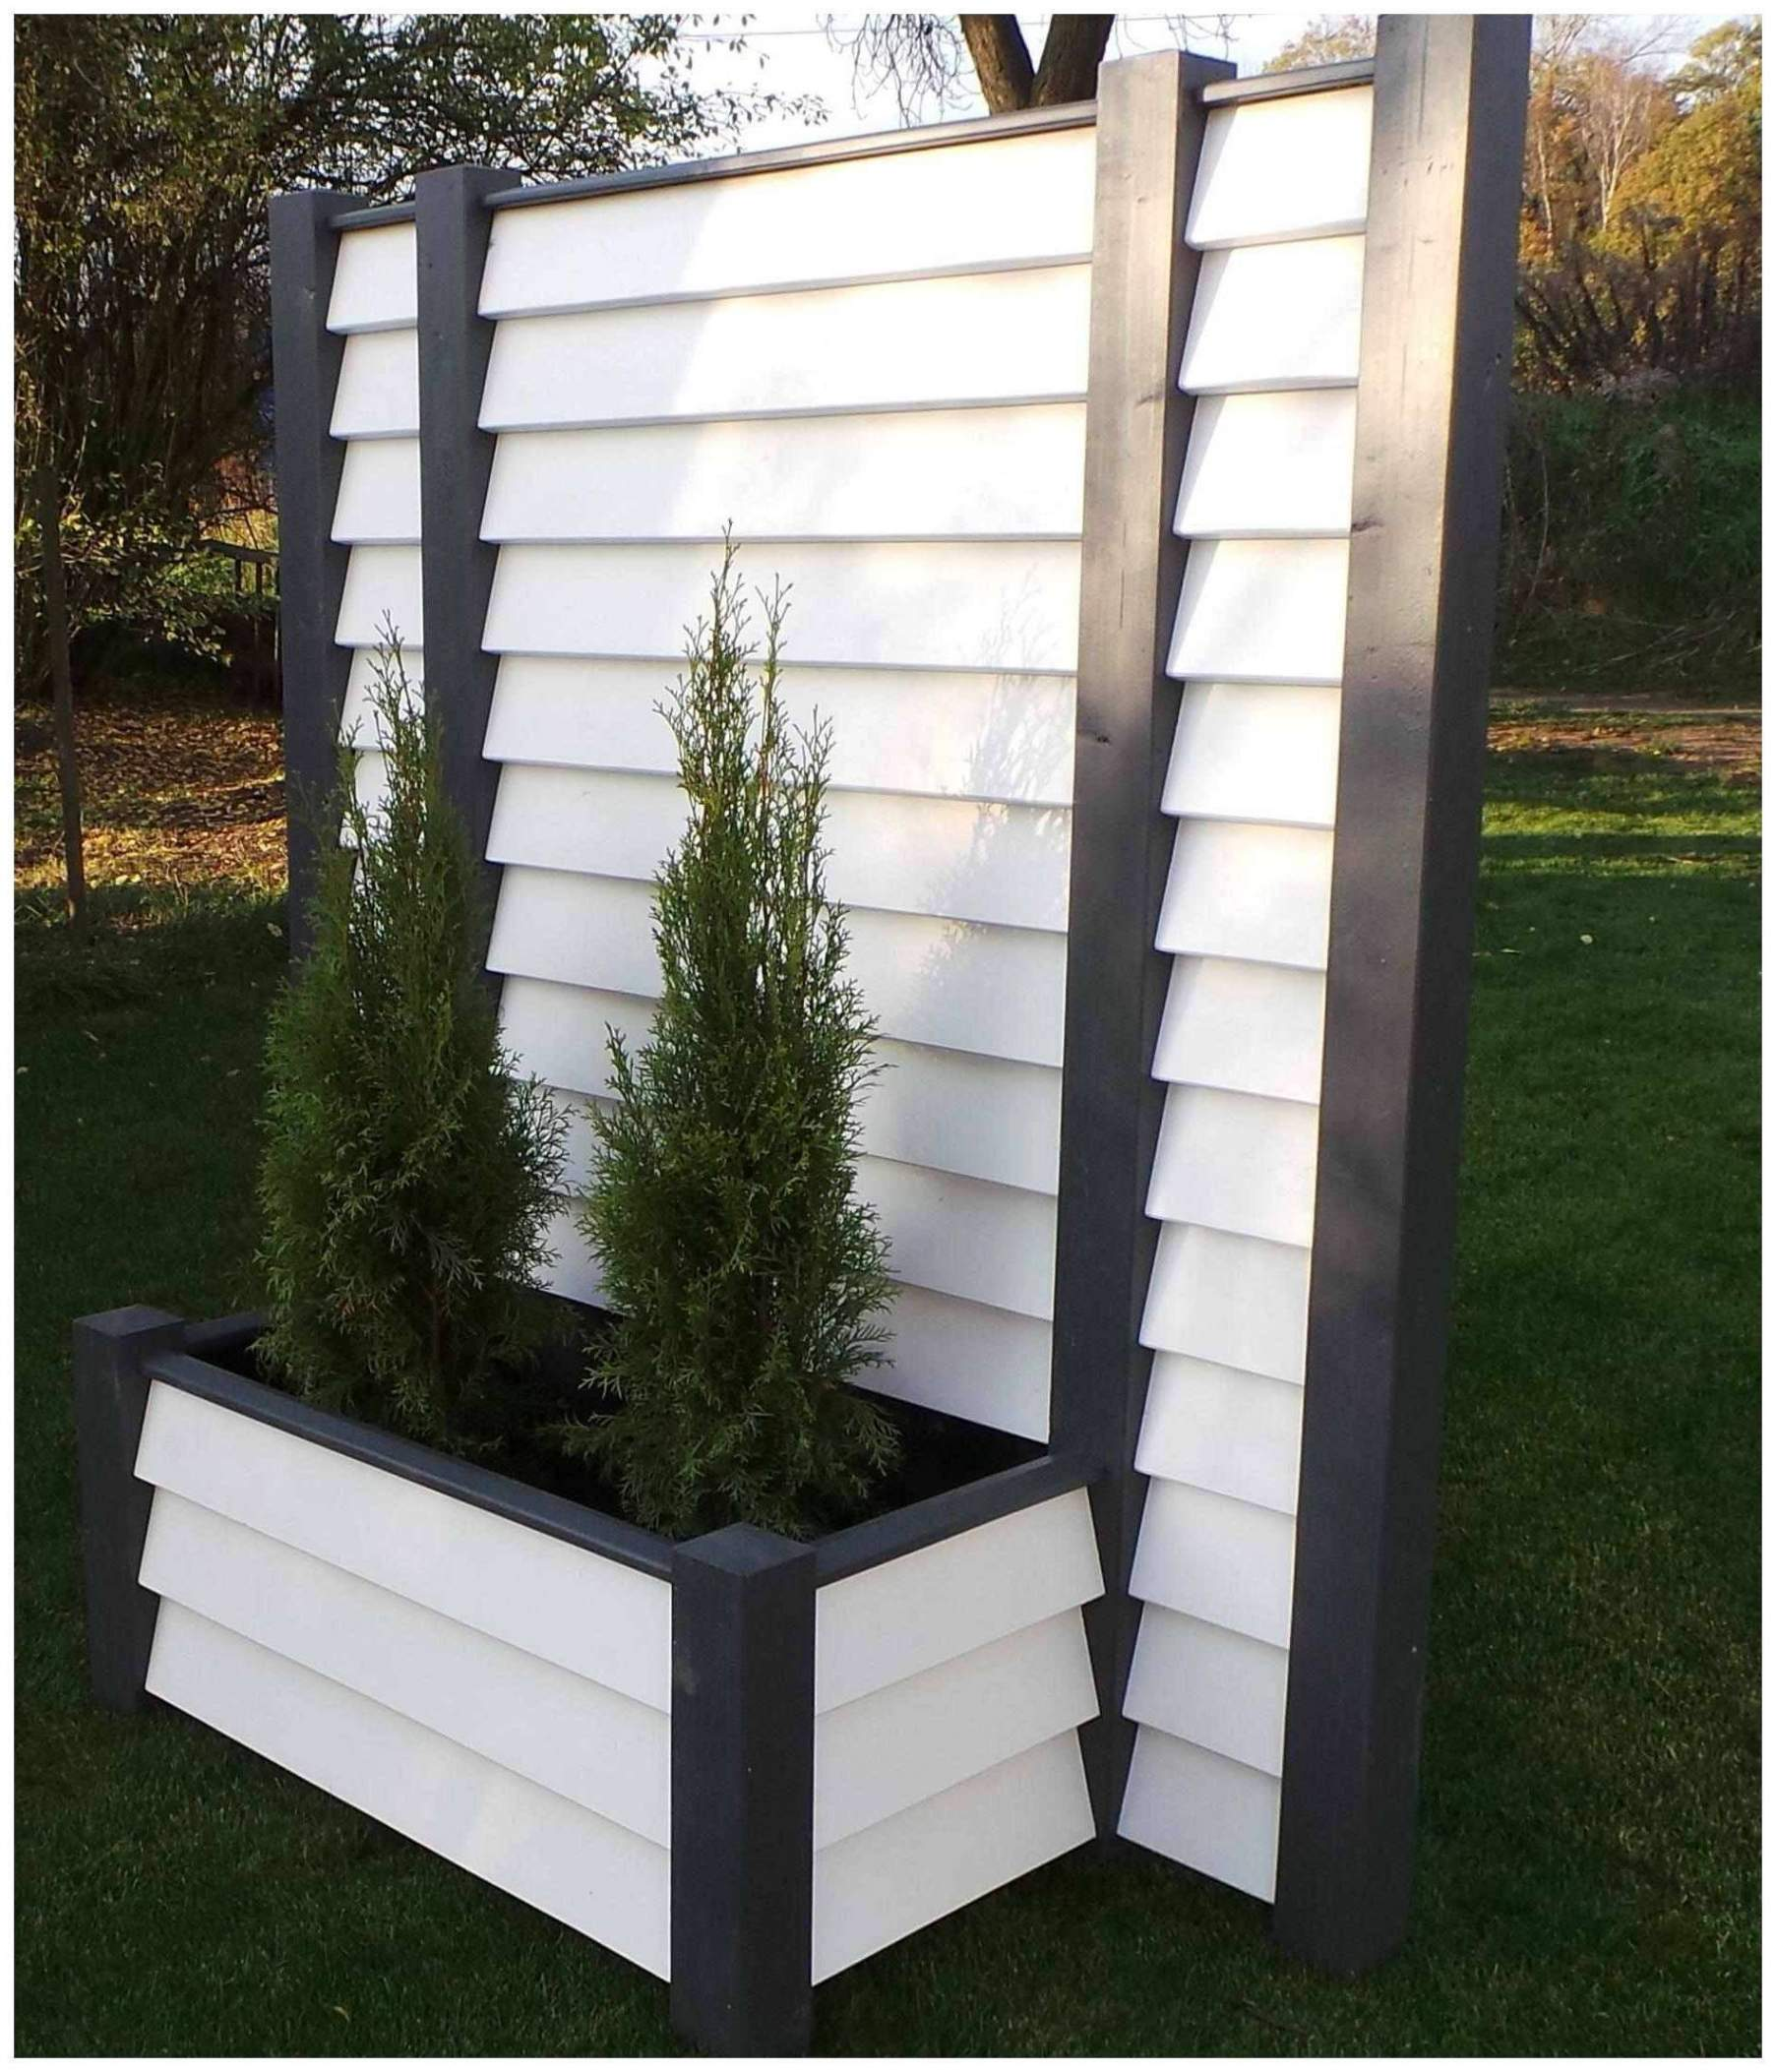 schaukel fur balkon showdenota pflanzen als sichtschutz im kubel pflanzen als sichtschutz im kubel